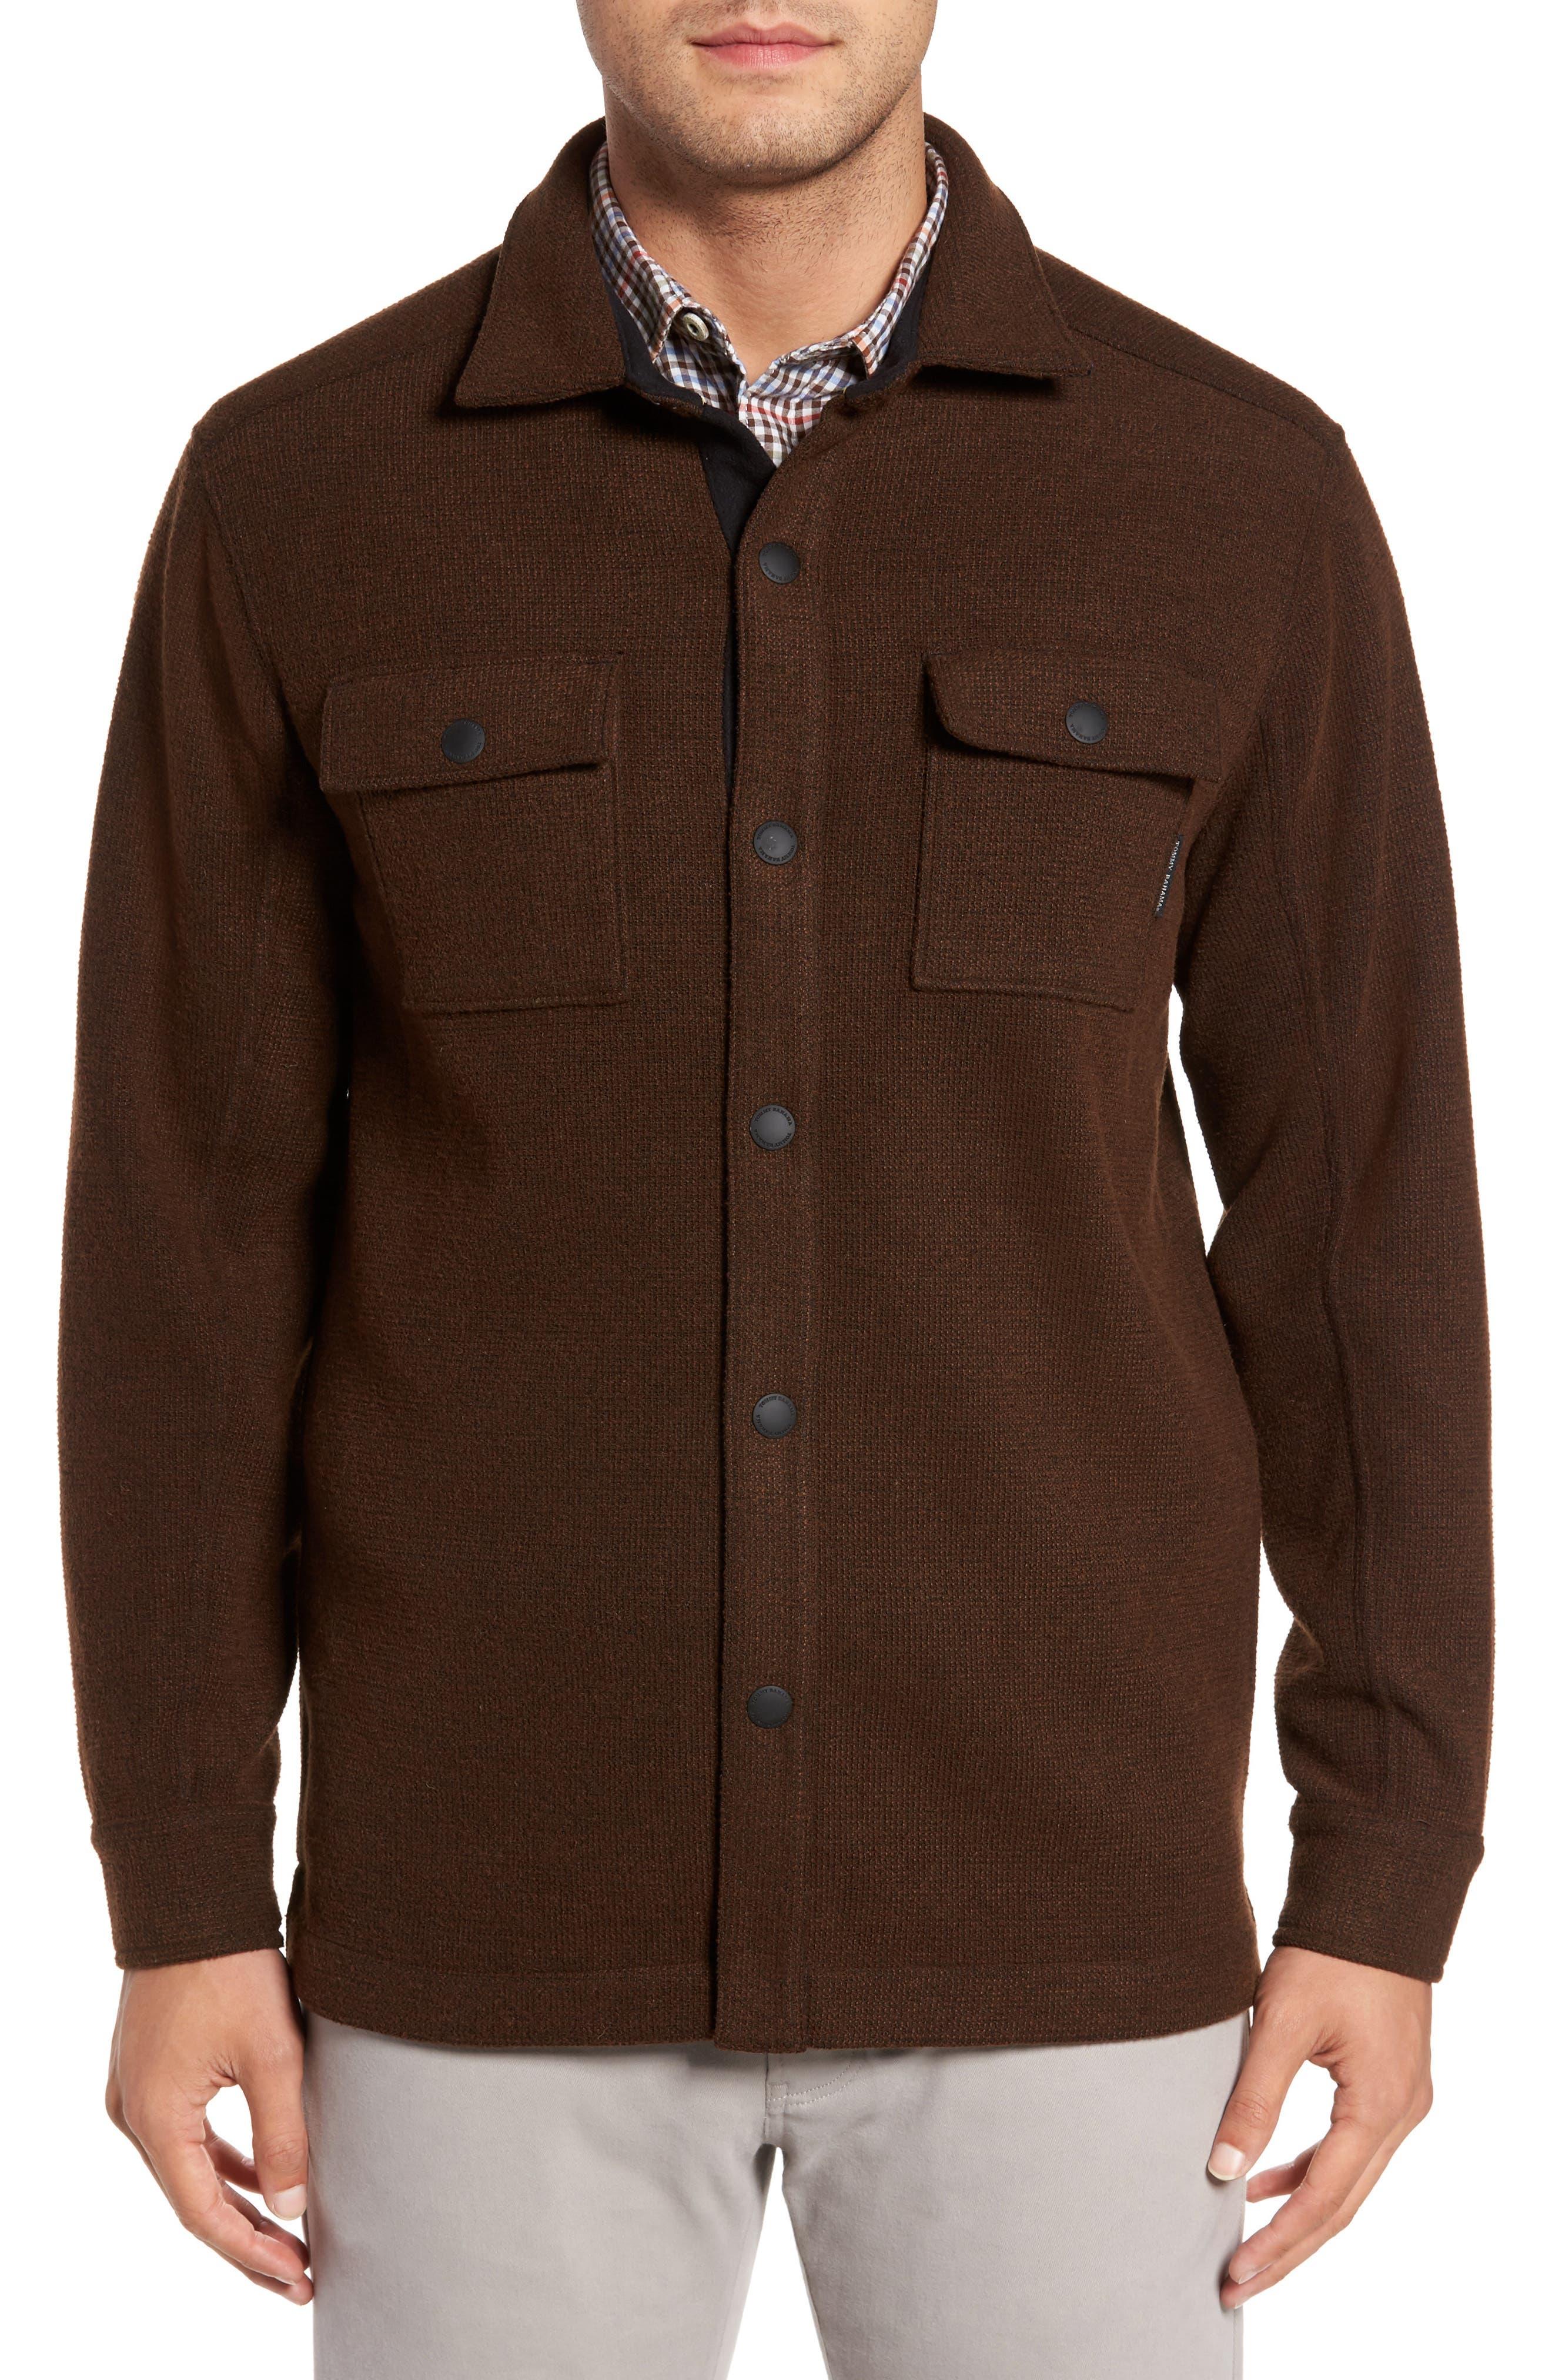 Alternate Image 1 Selected - Tommy Bahama Paradise Creek Snap Front Fleece Jacket